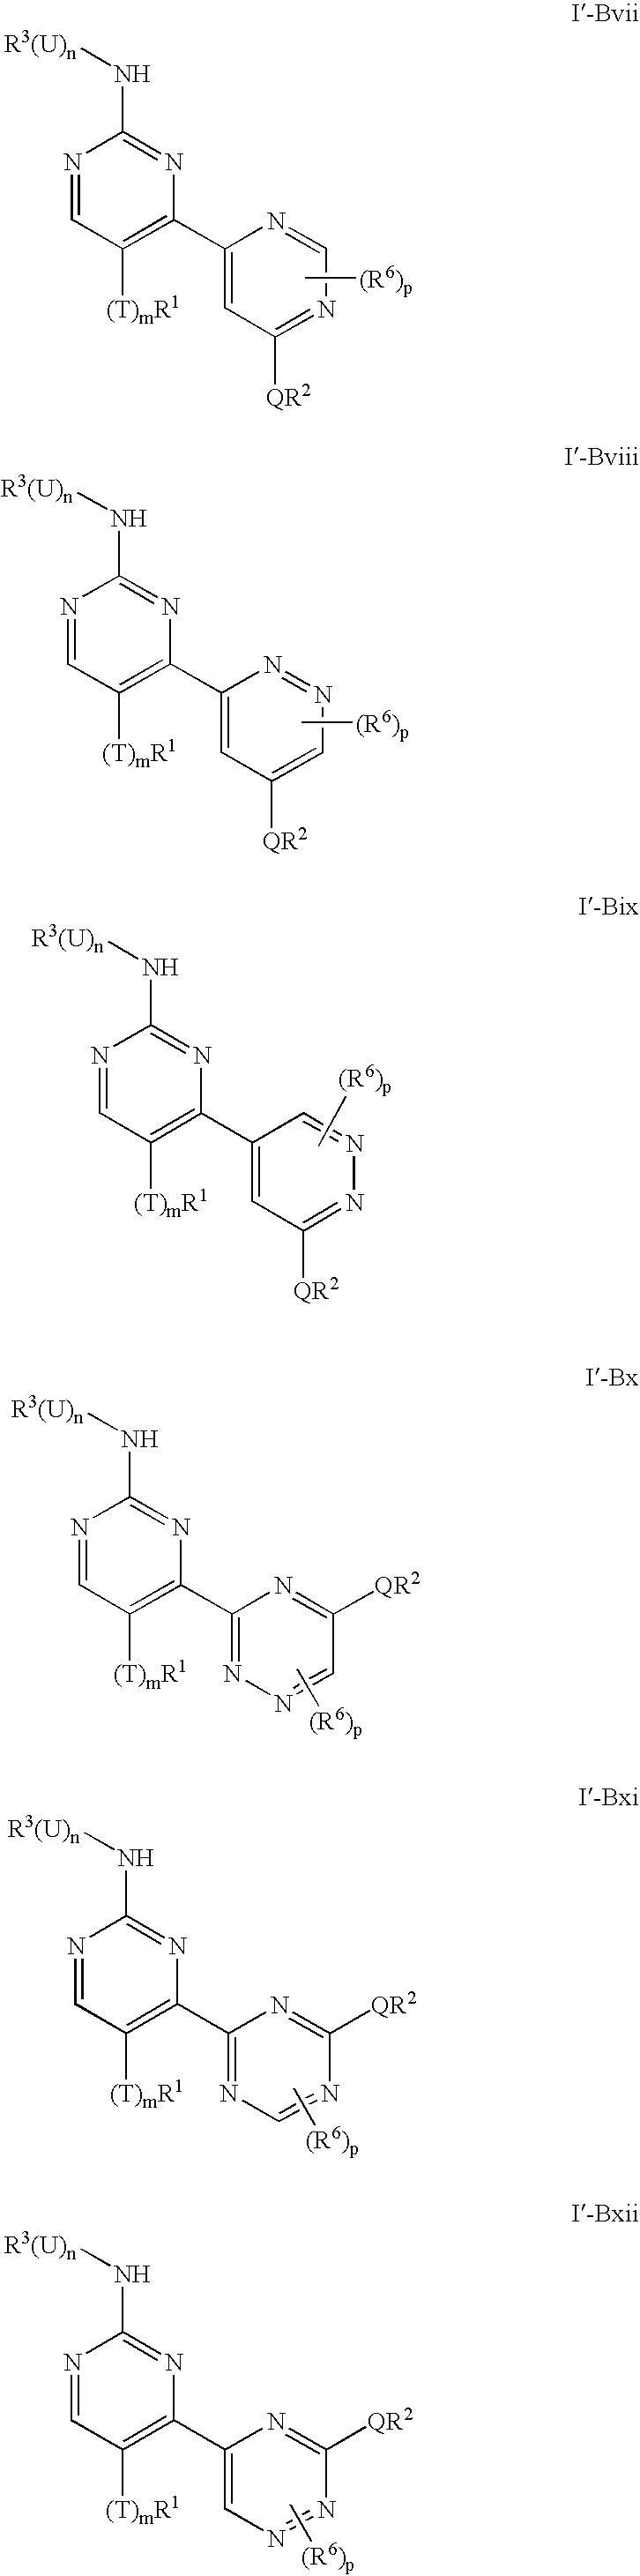 Us7304071b2 Protein Kinase Inhibitors And Uses Thereof Google Bix Block Diagram Figure Us07304071 20071204 C00026